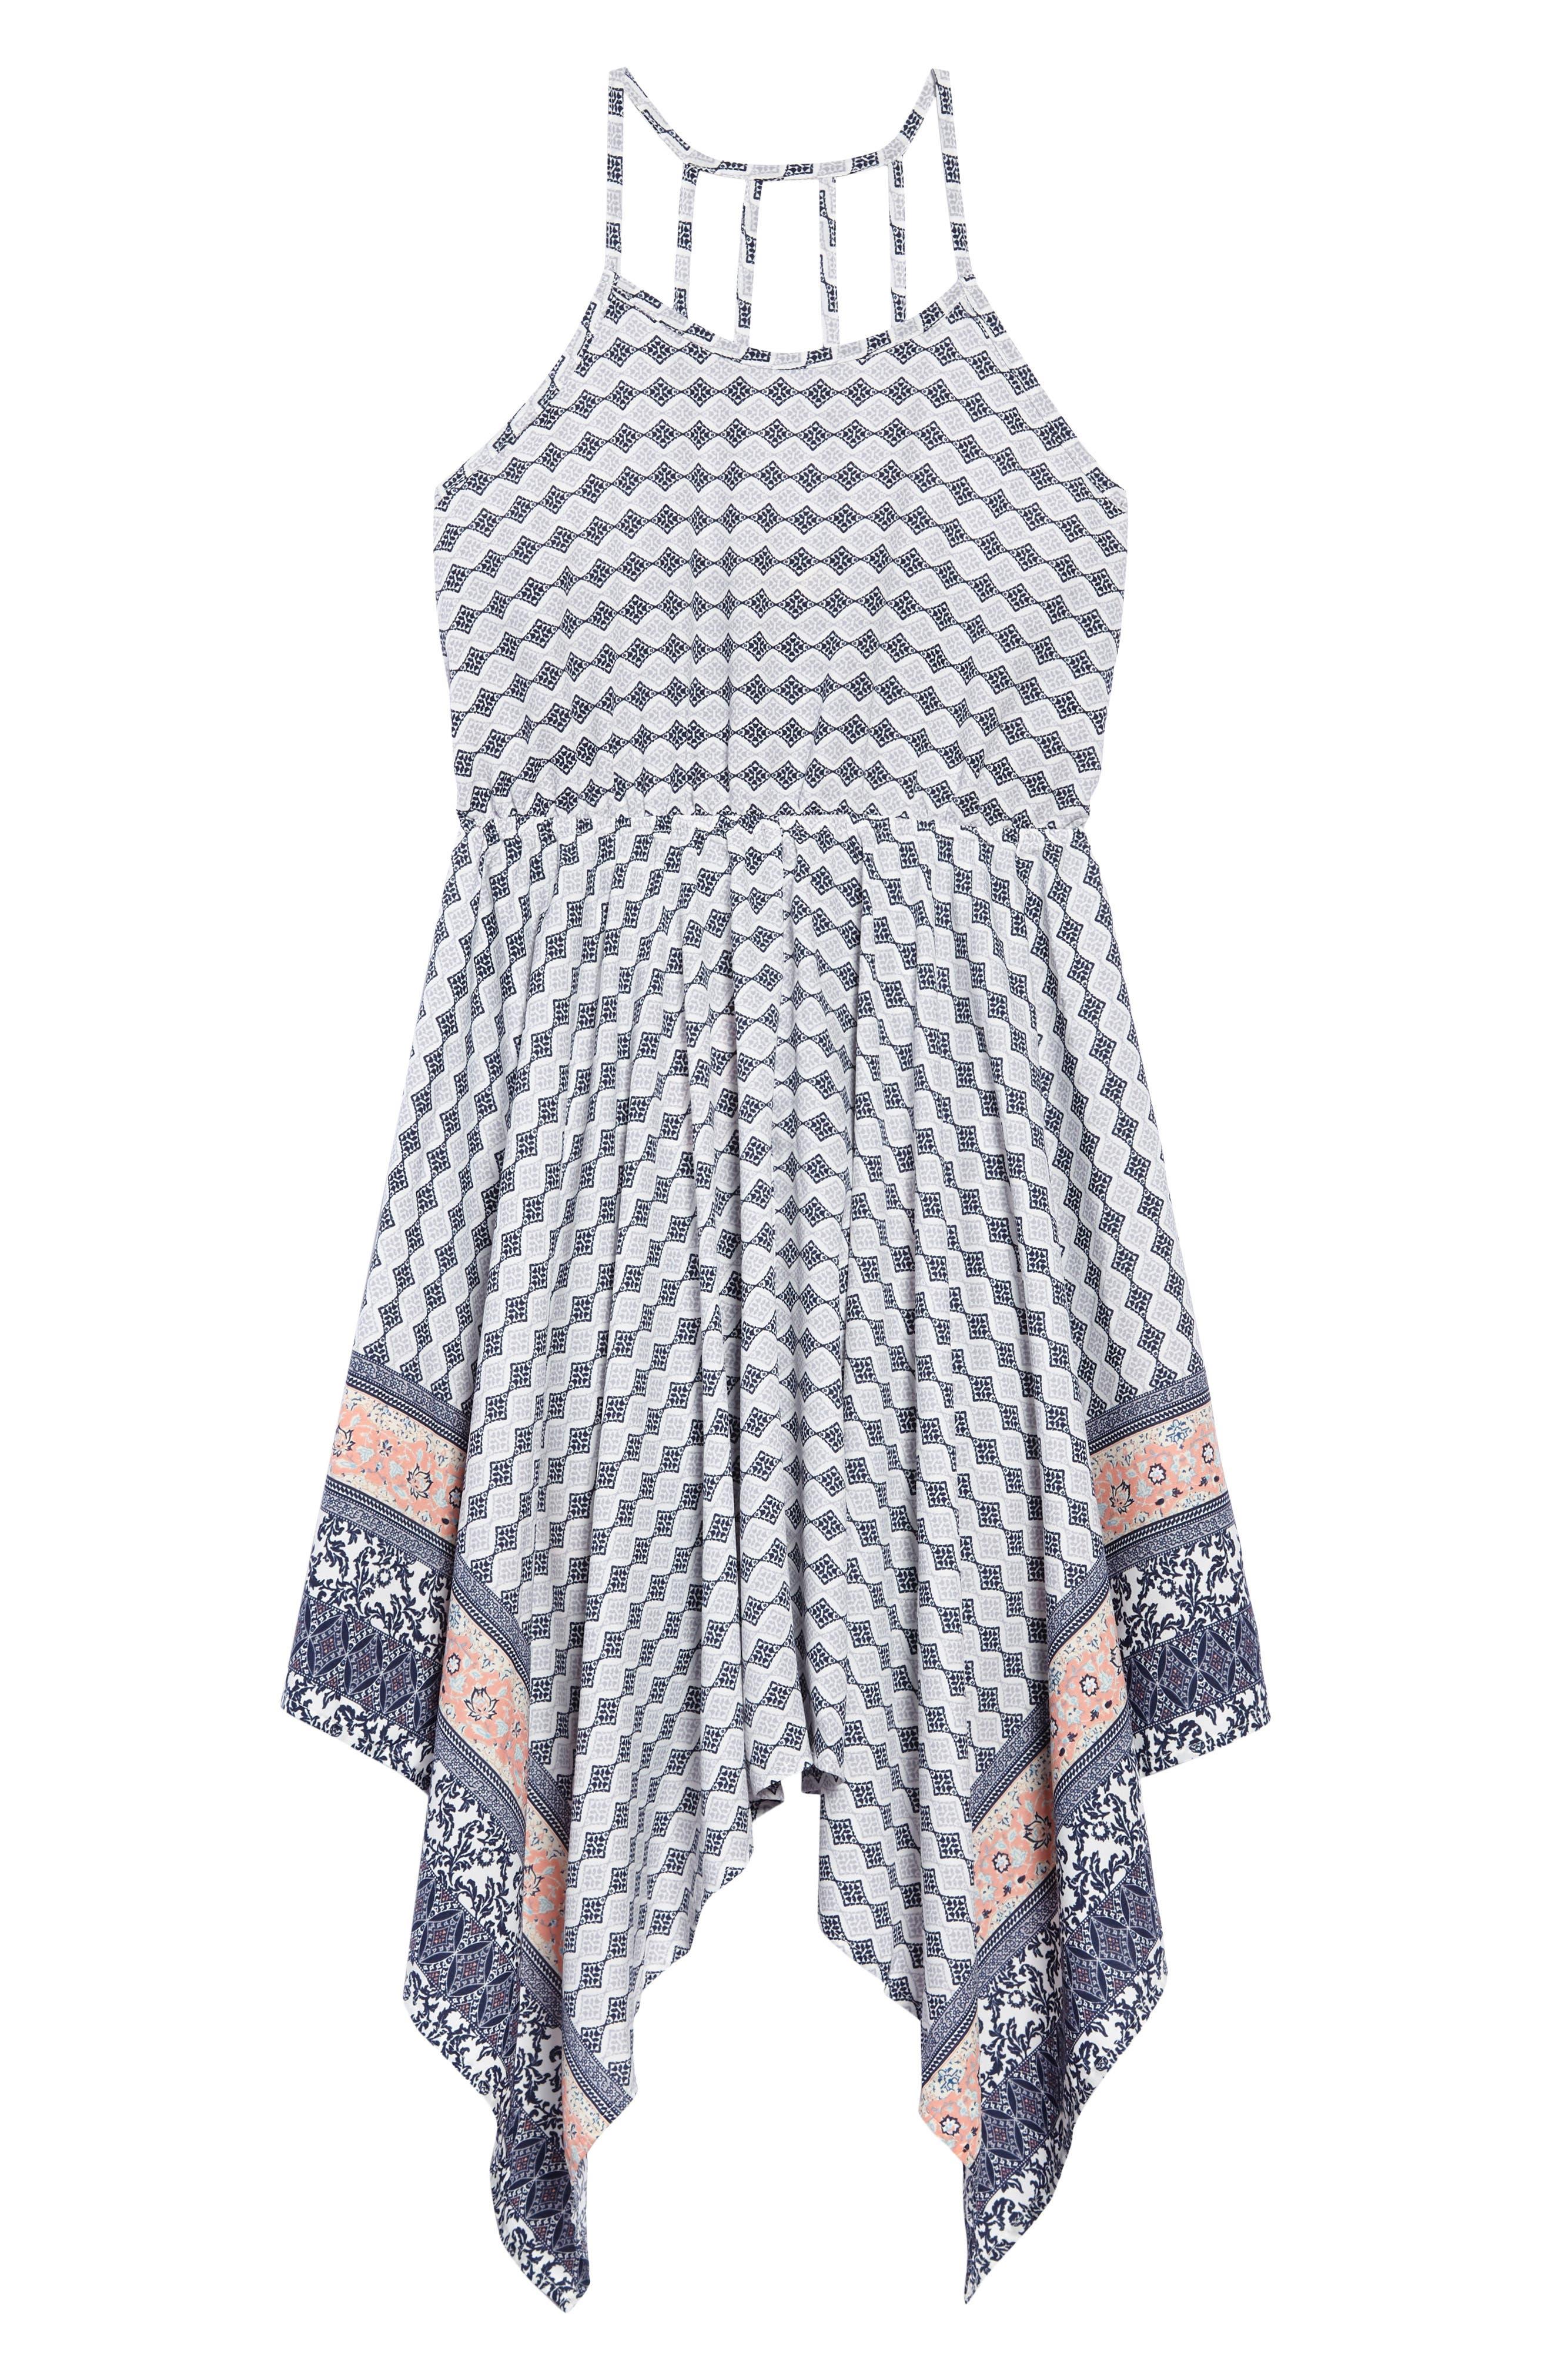 Alternate Image 1 Selected - Soprano Print Handkerchief Dress (Big Girls)